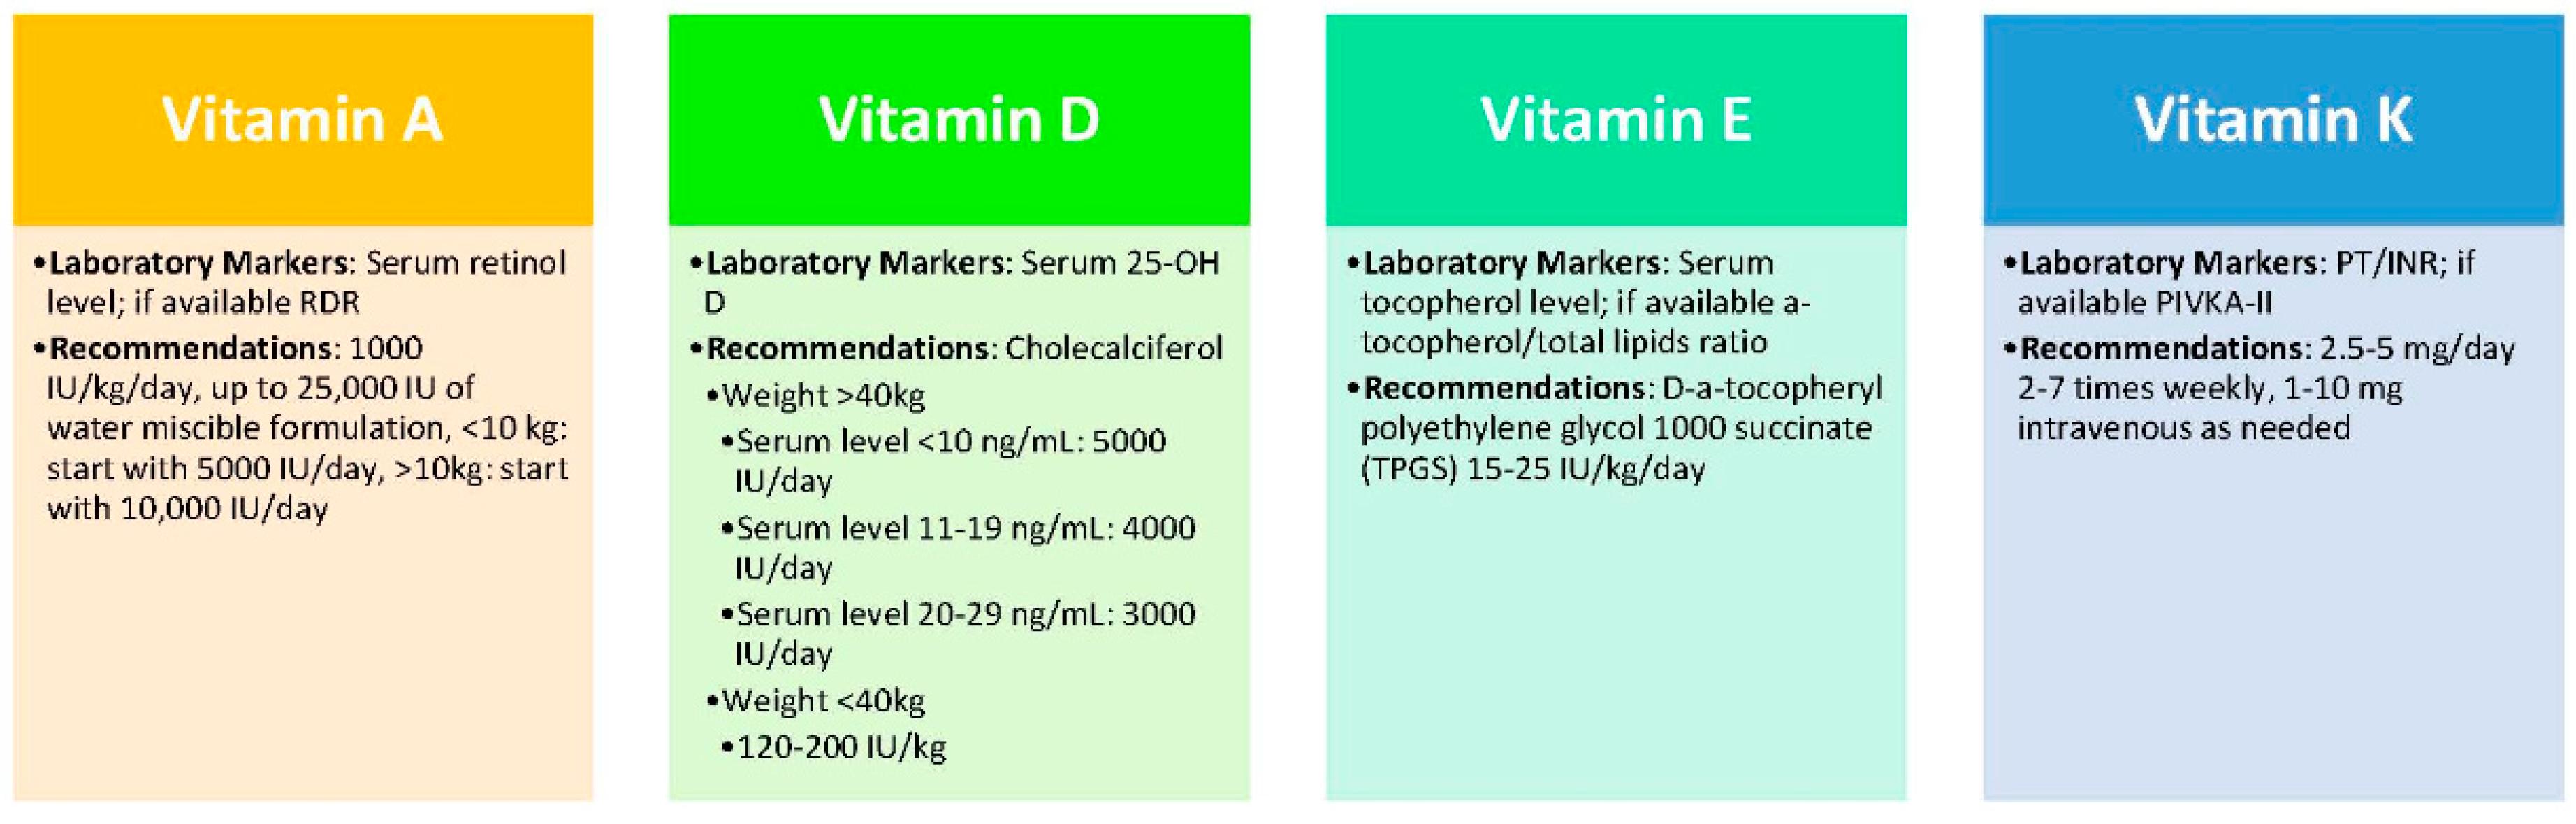 vitamin d deficiency treatment guidelines pediatric